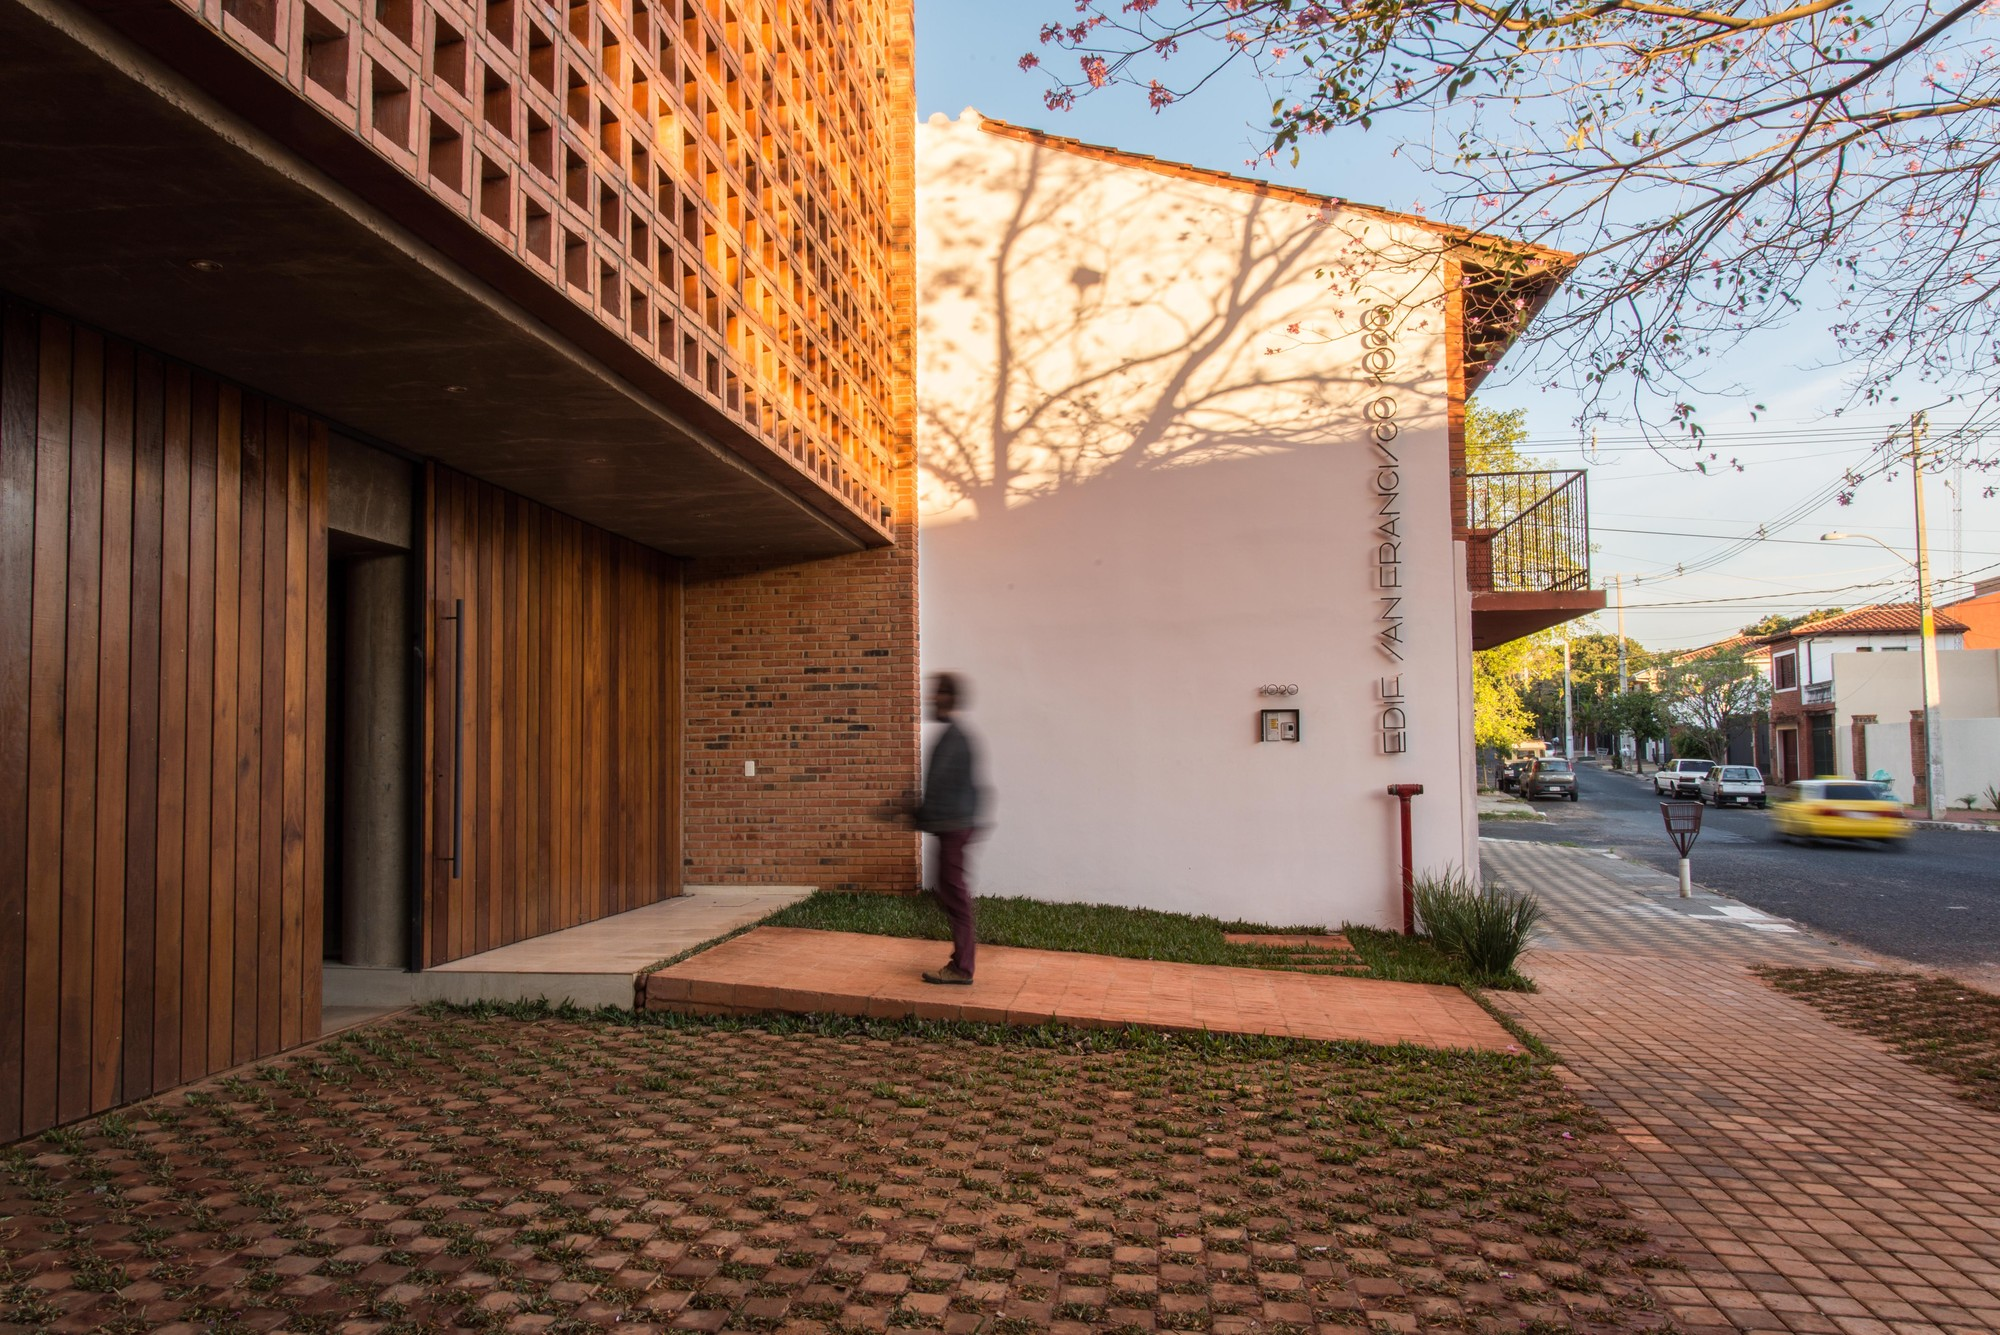 Edificio San Francisco, Arq. José Cubilla (foto: Lauro Rocha)